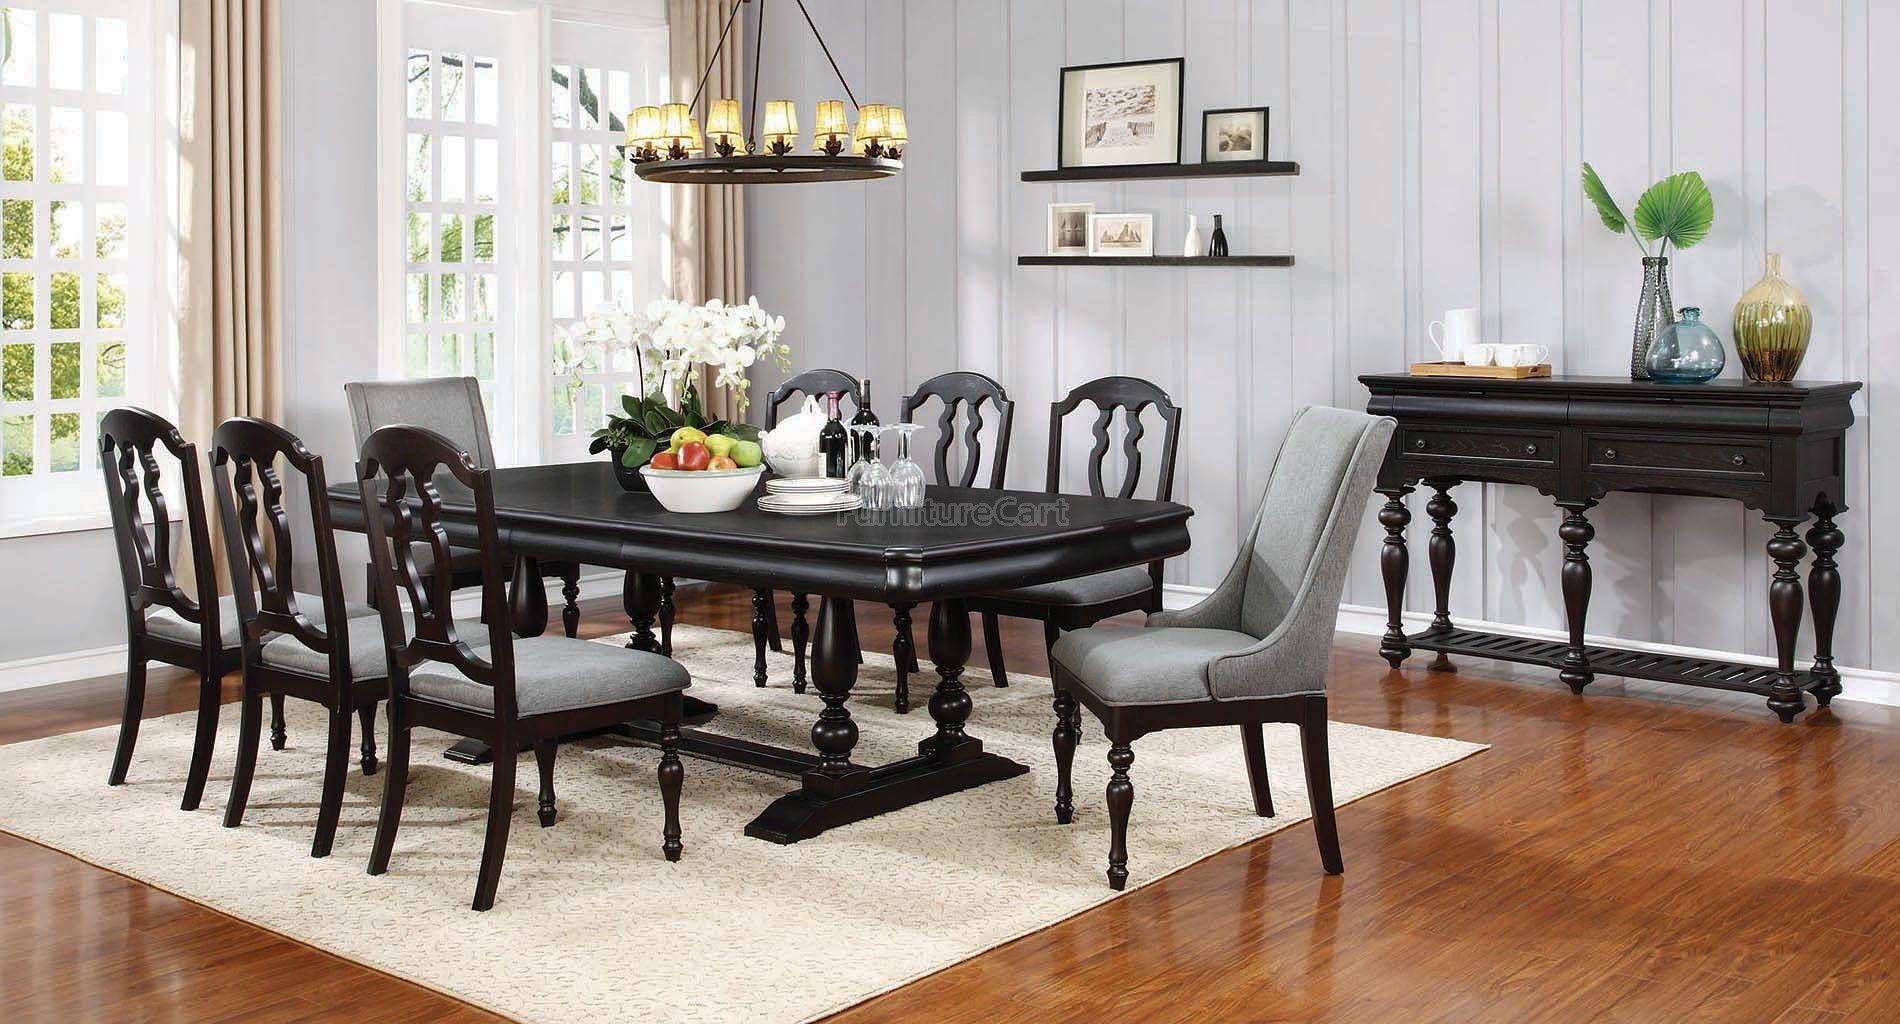 Leon Dining Room Set Dining Room Furniture Sets Dining Room Sets Dining Room Chairs